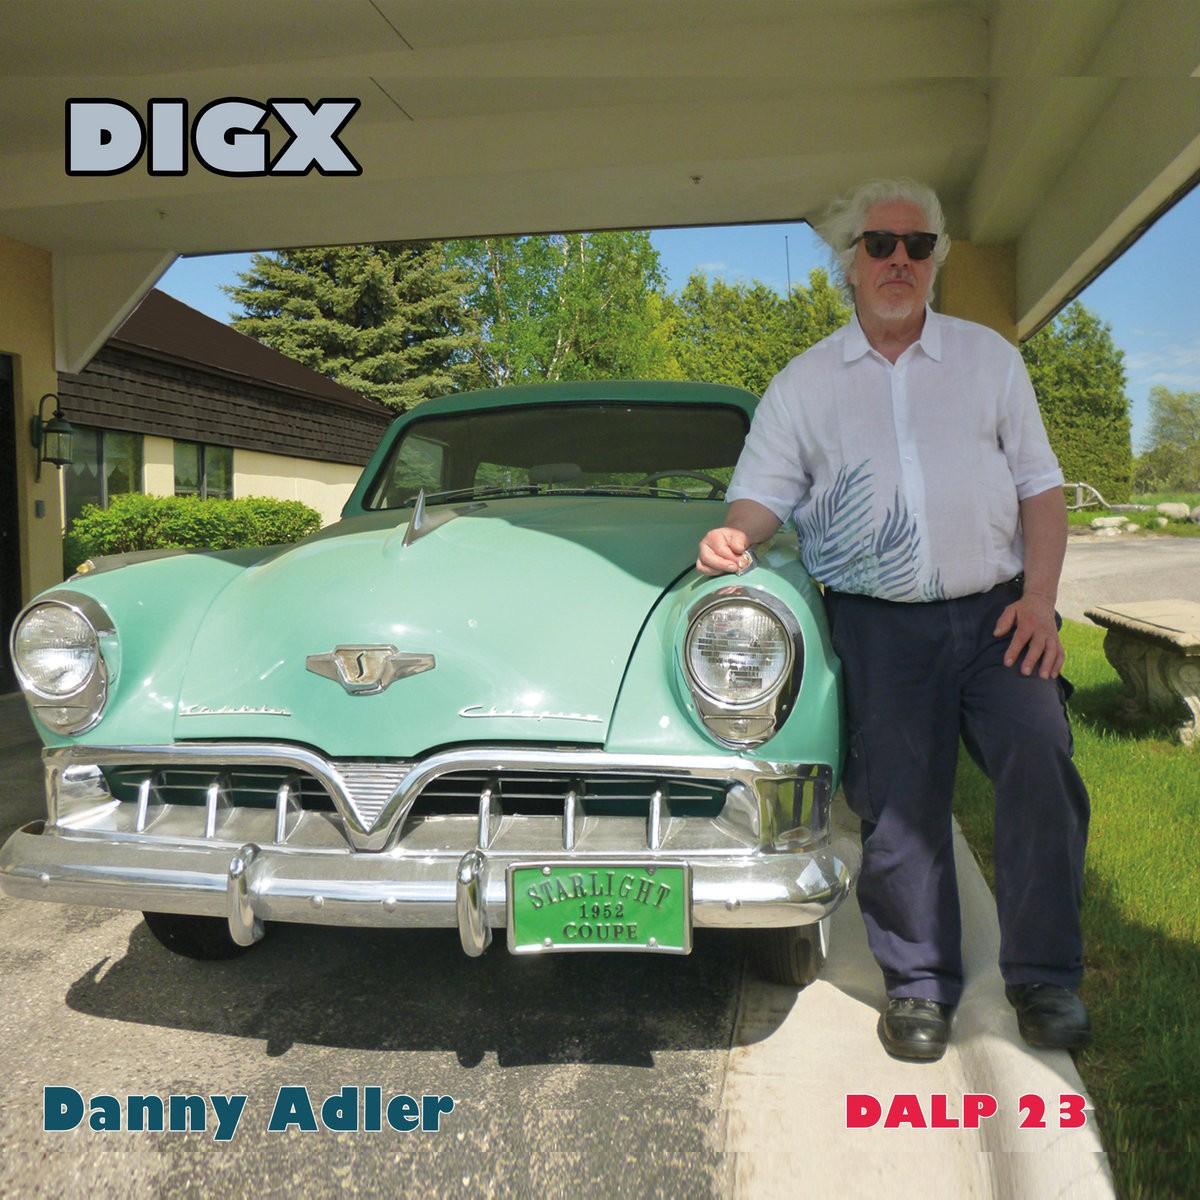 Danny Adler - Digx